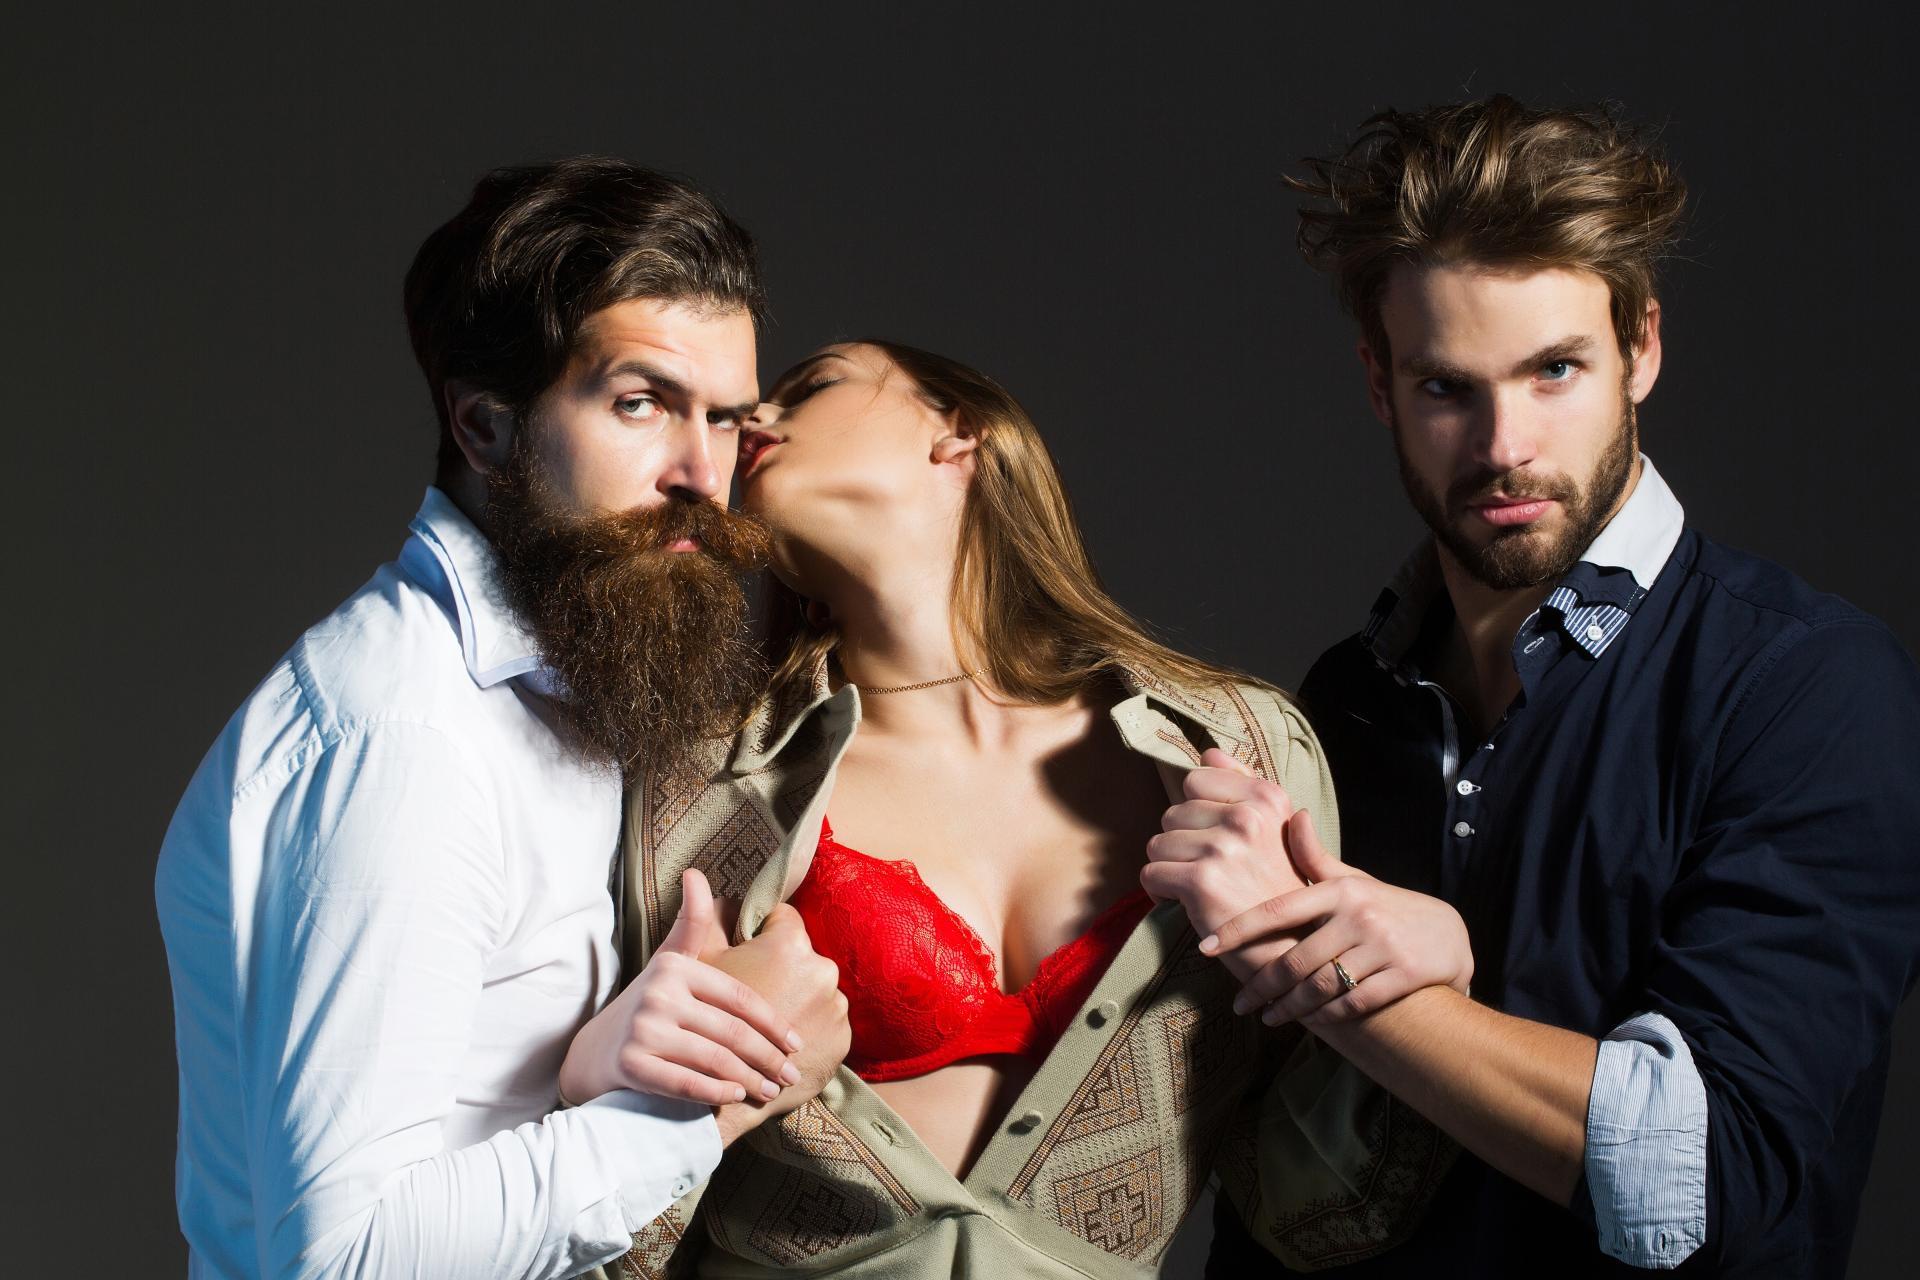 My threesome story